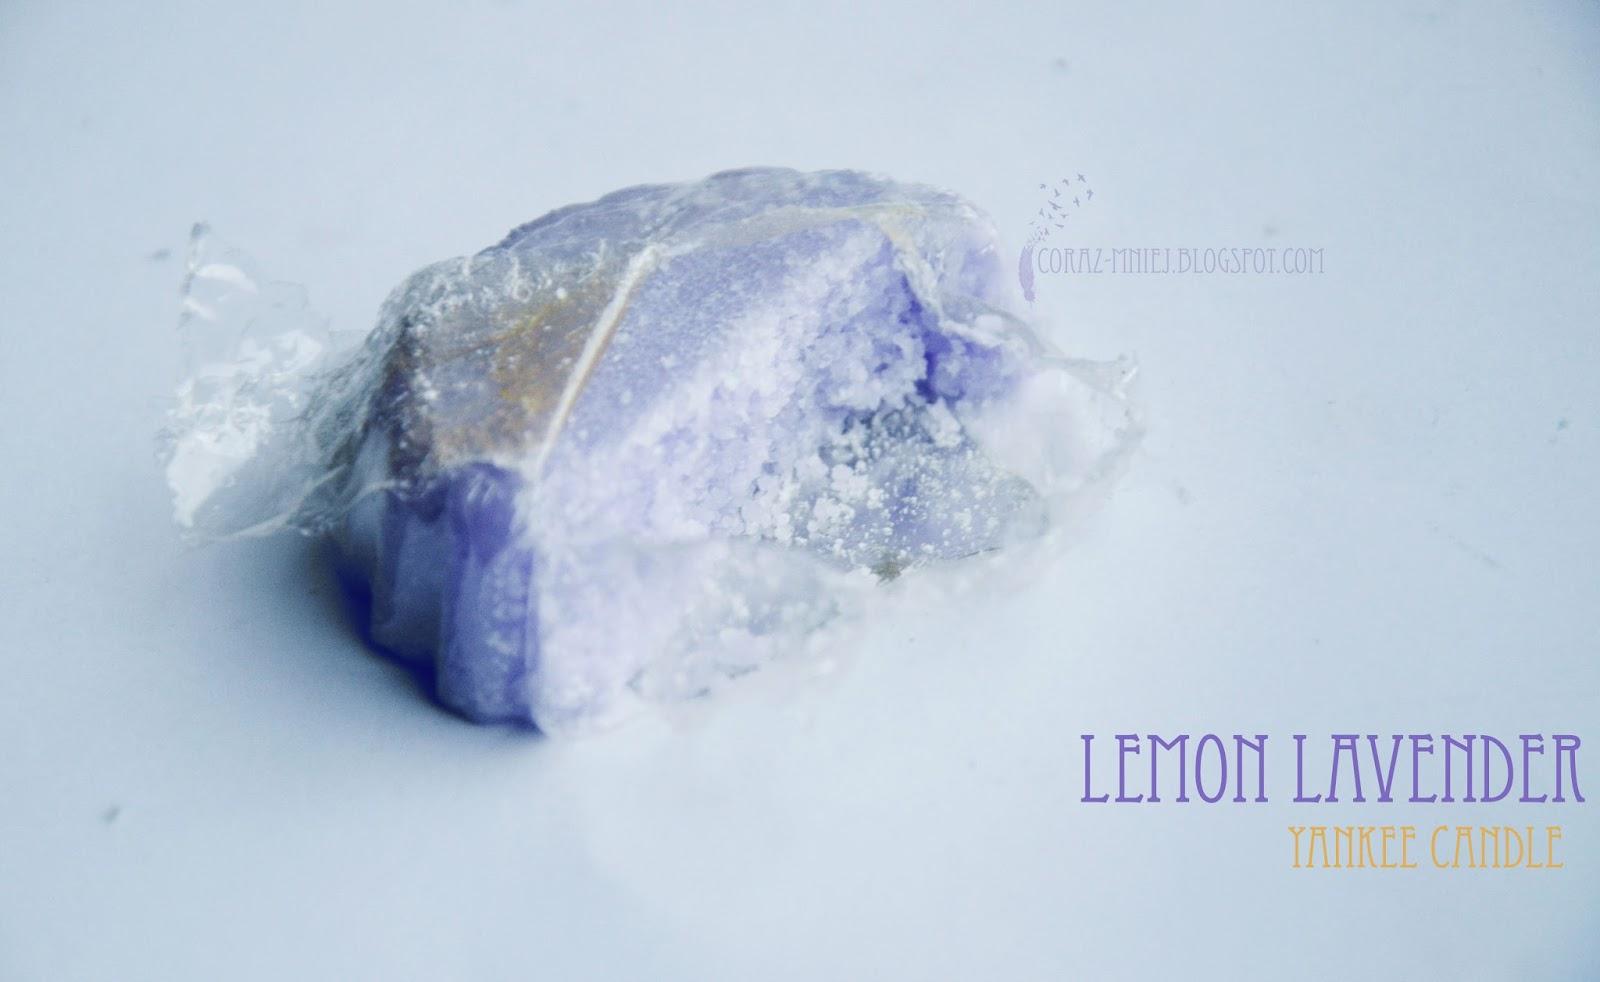 Yankee-candle-lemon-lavender